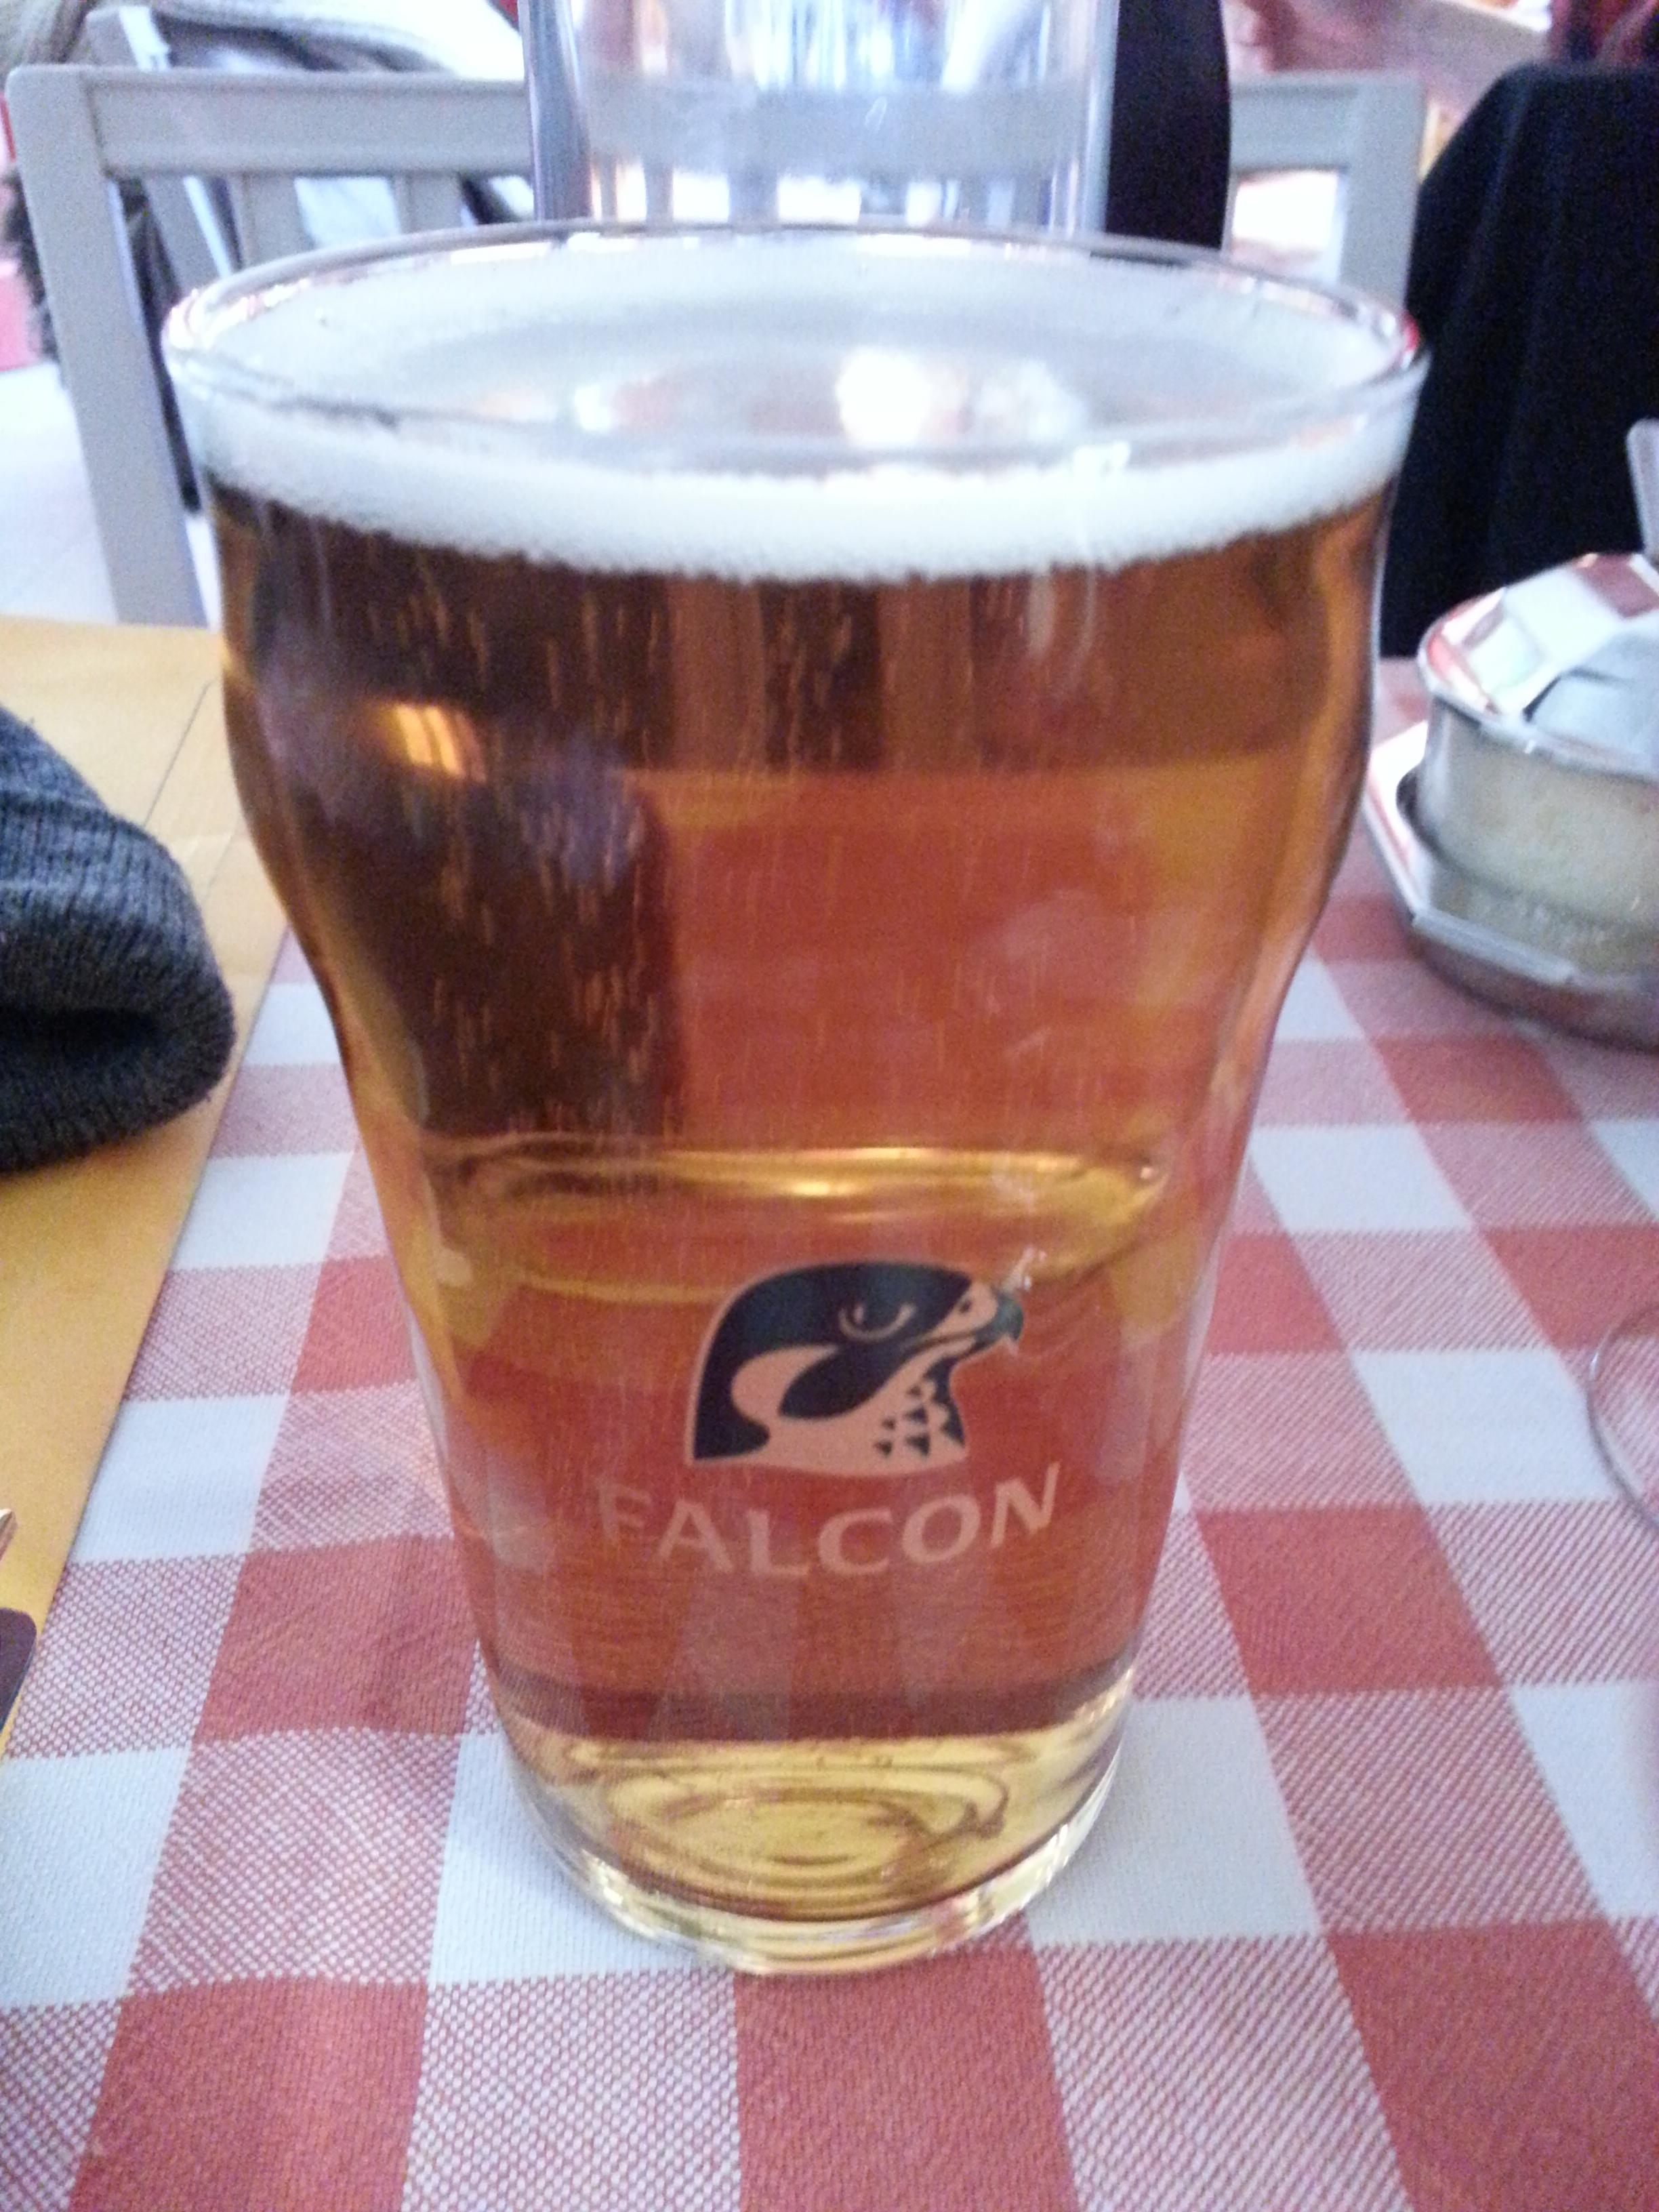 Falcon, my favorite Swedish beer